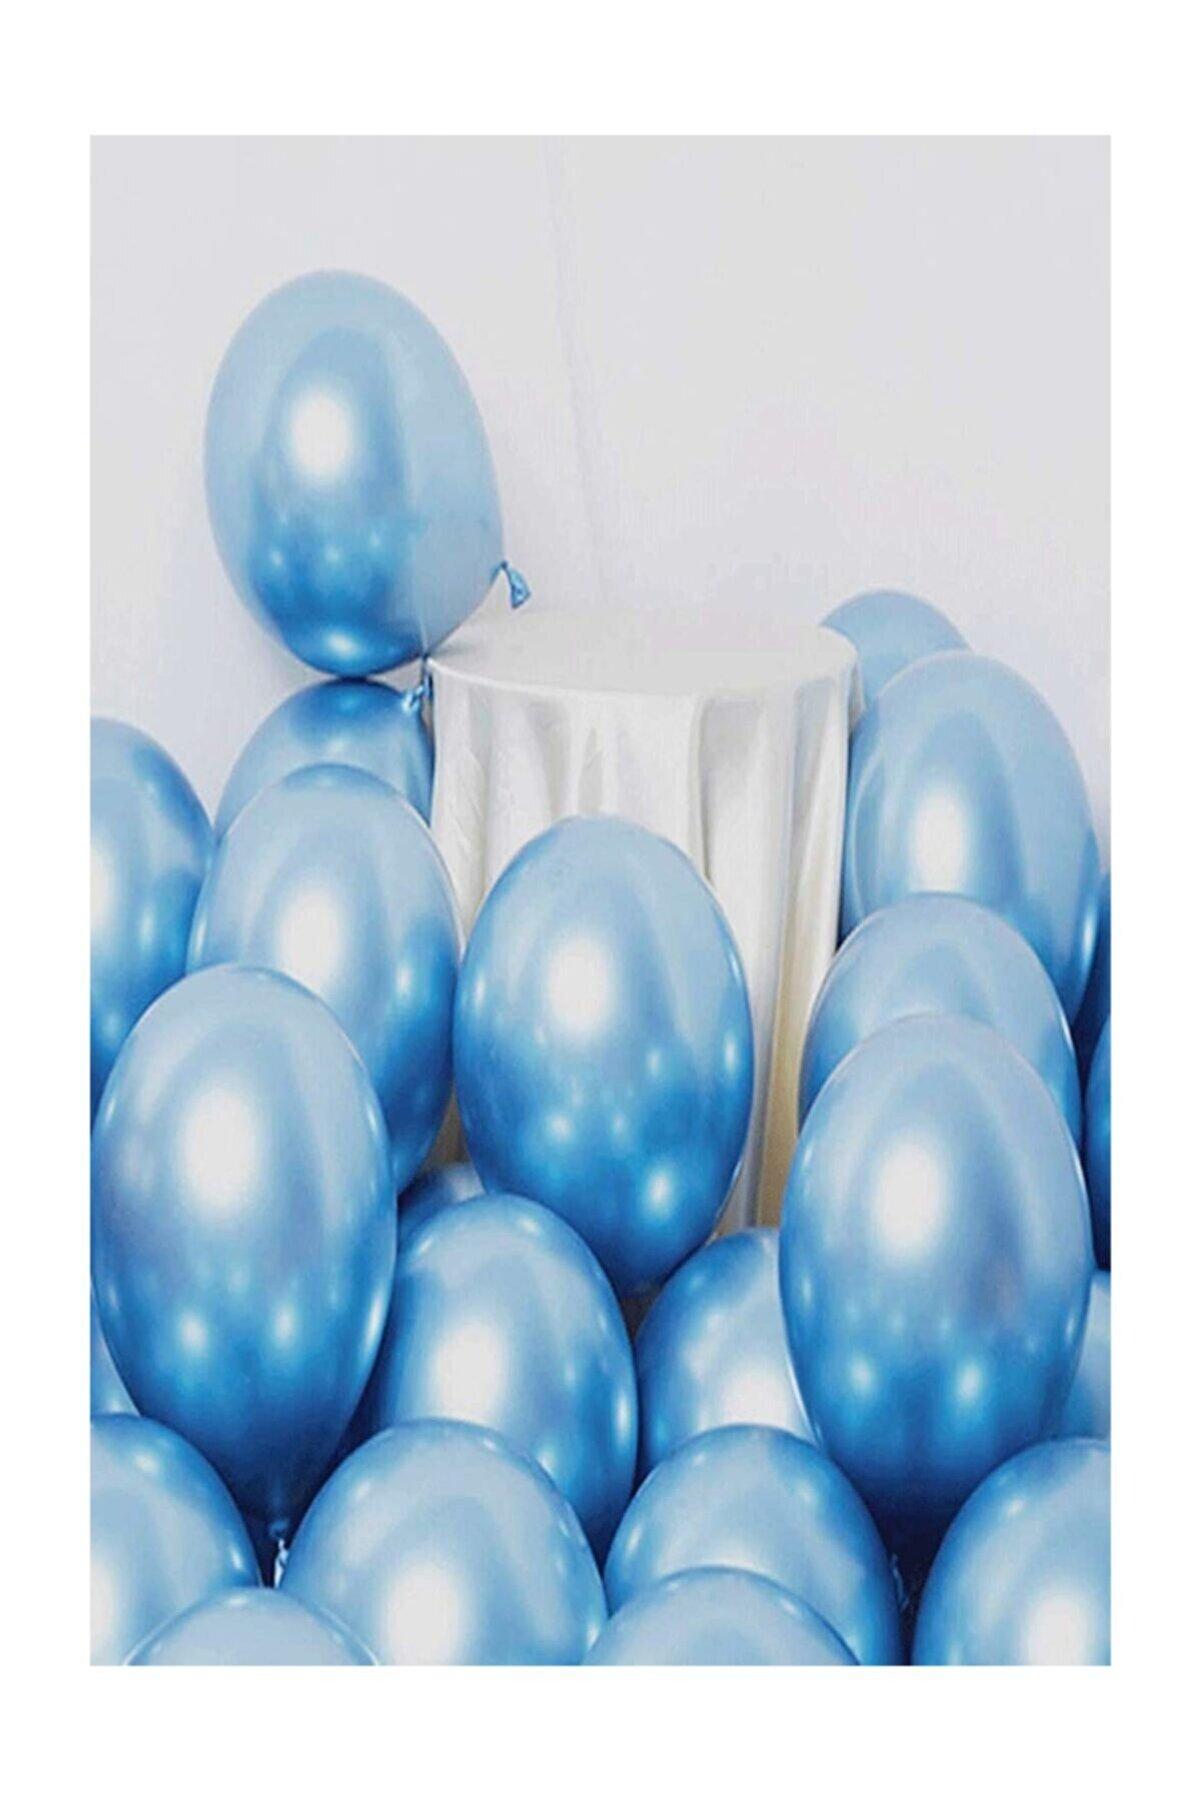 Magic Hobby Krom Parlak Metalik Mavi Renk 20'li Balon